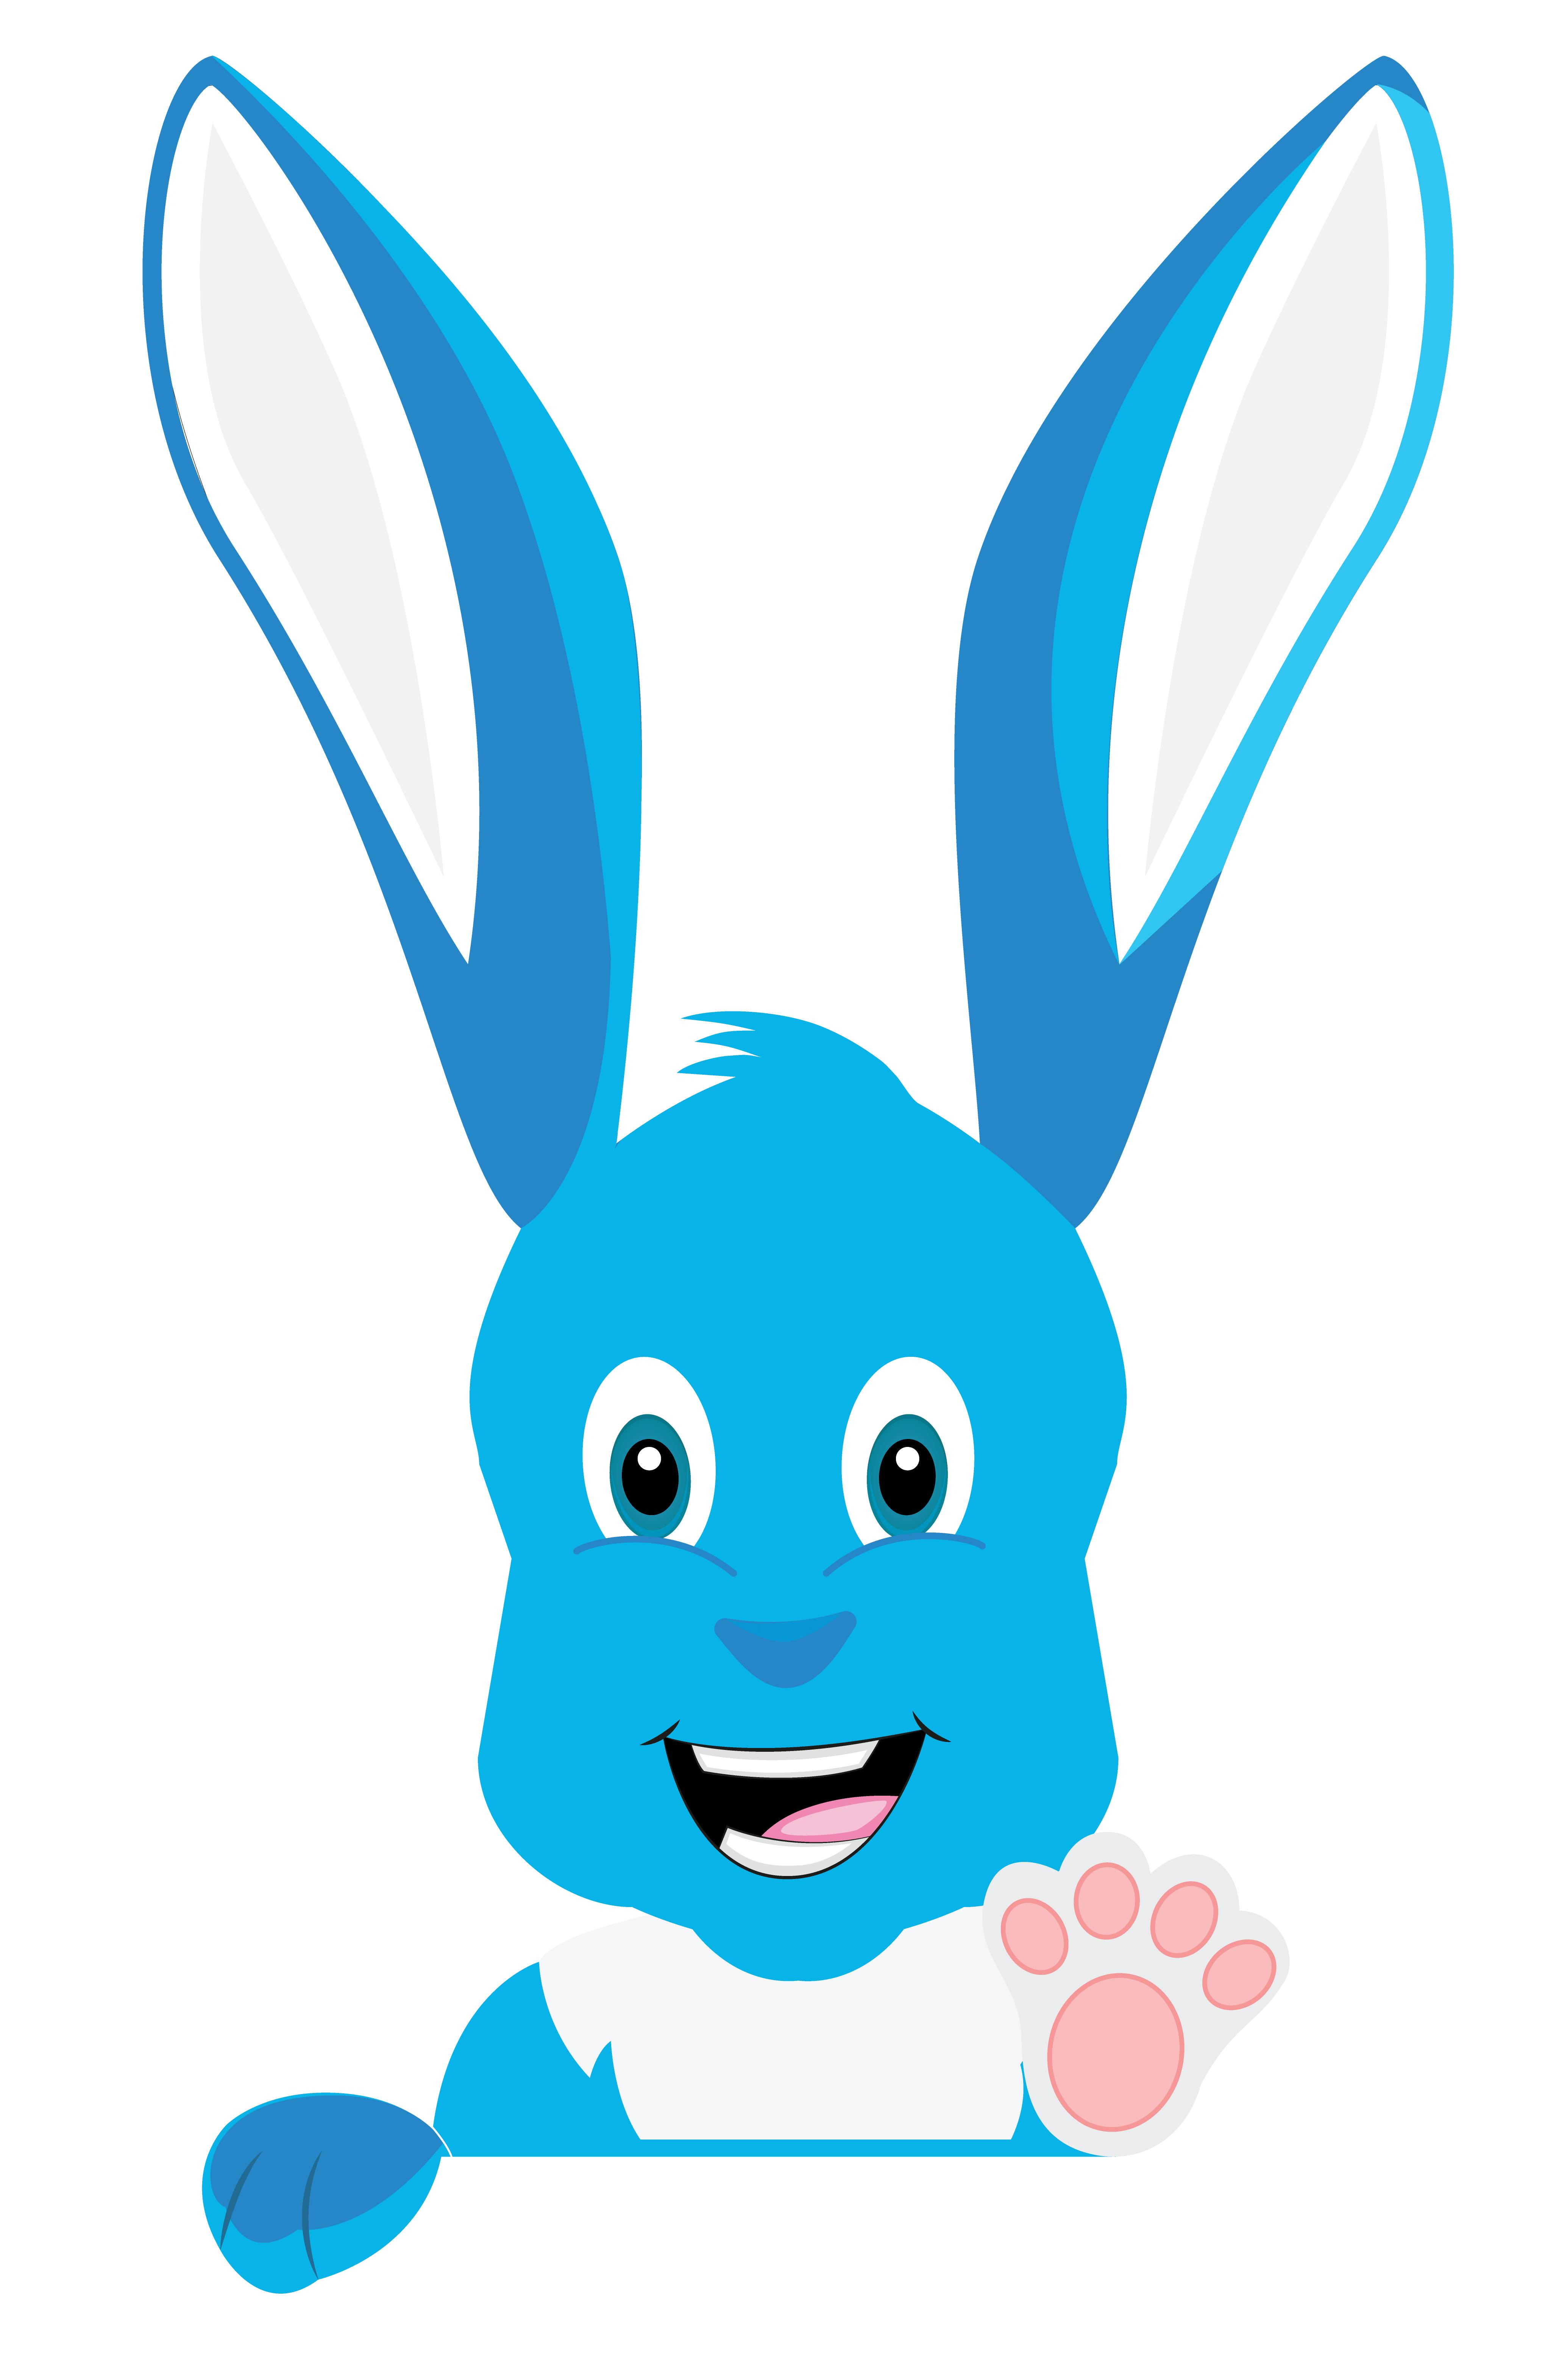 Harehub Mascot Hector